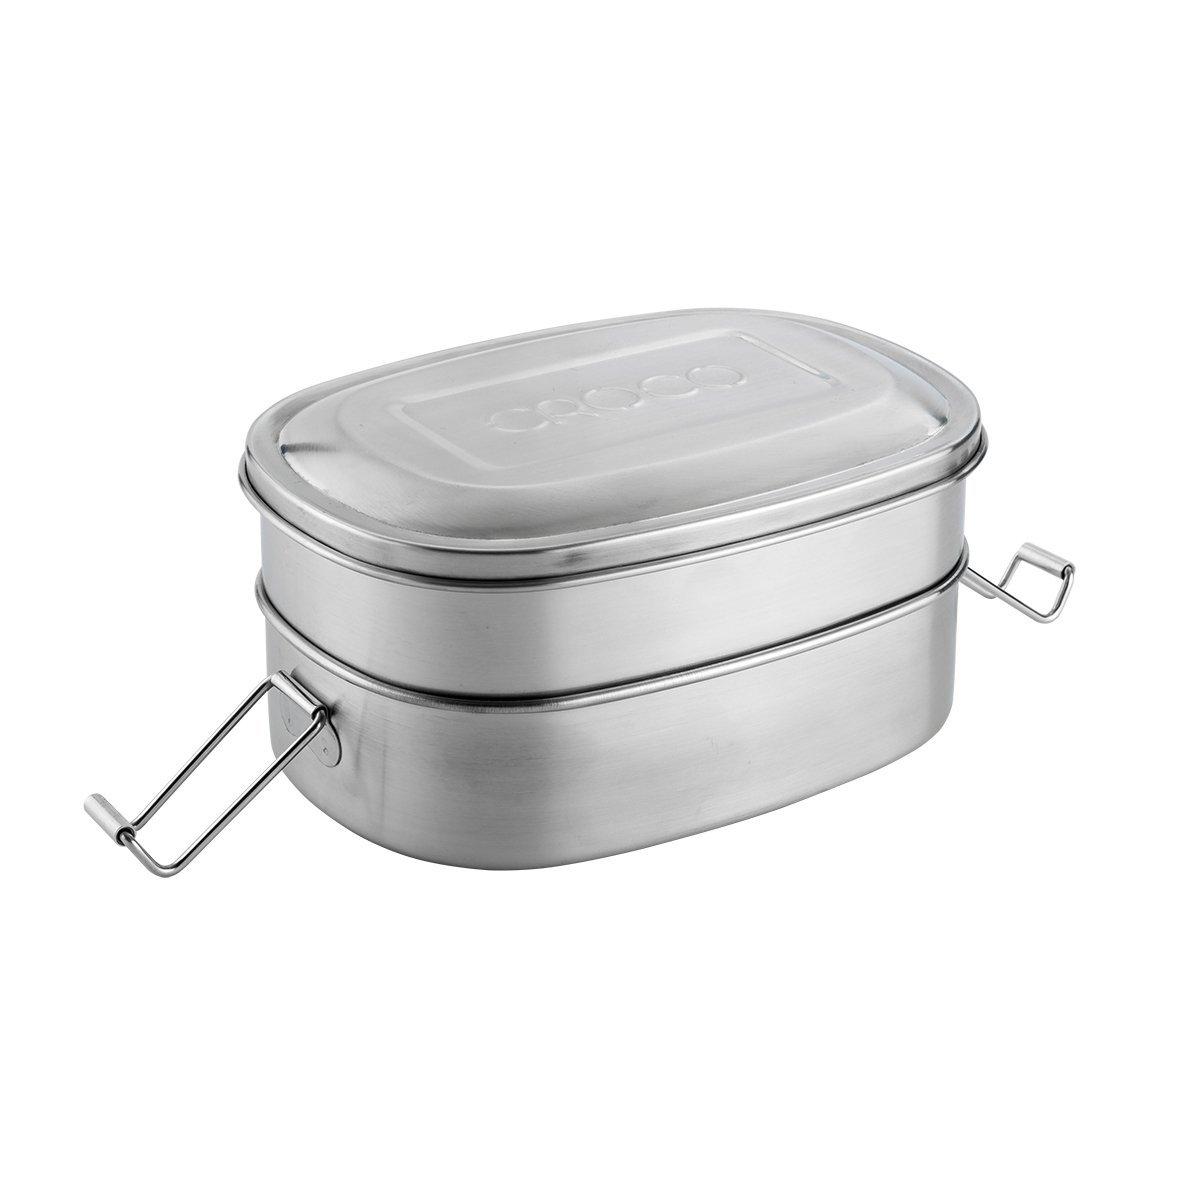 Croco Stacker - Bento Luncbox & Snack Pod Set image